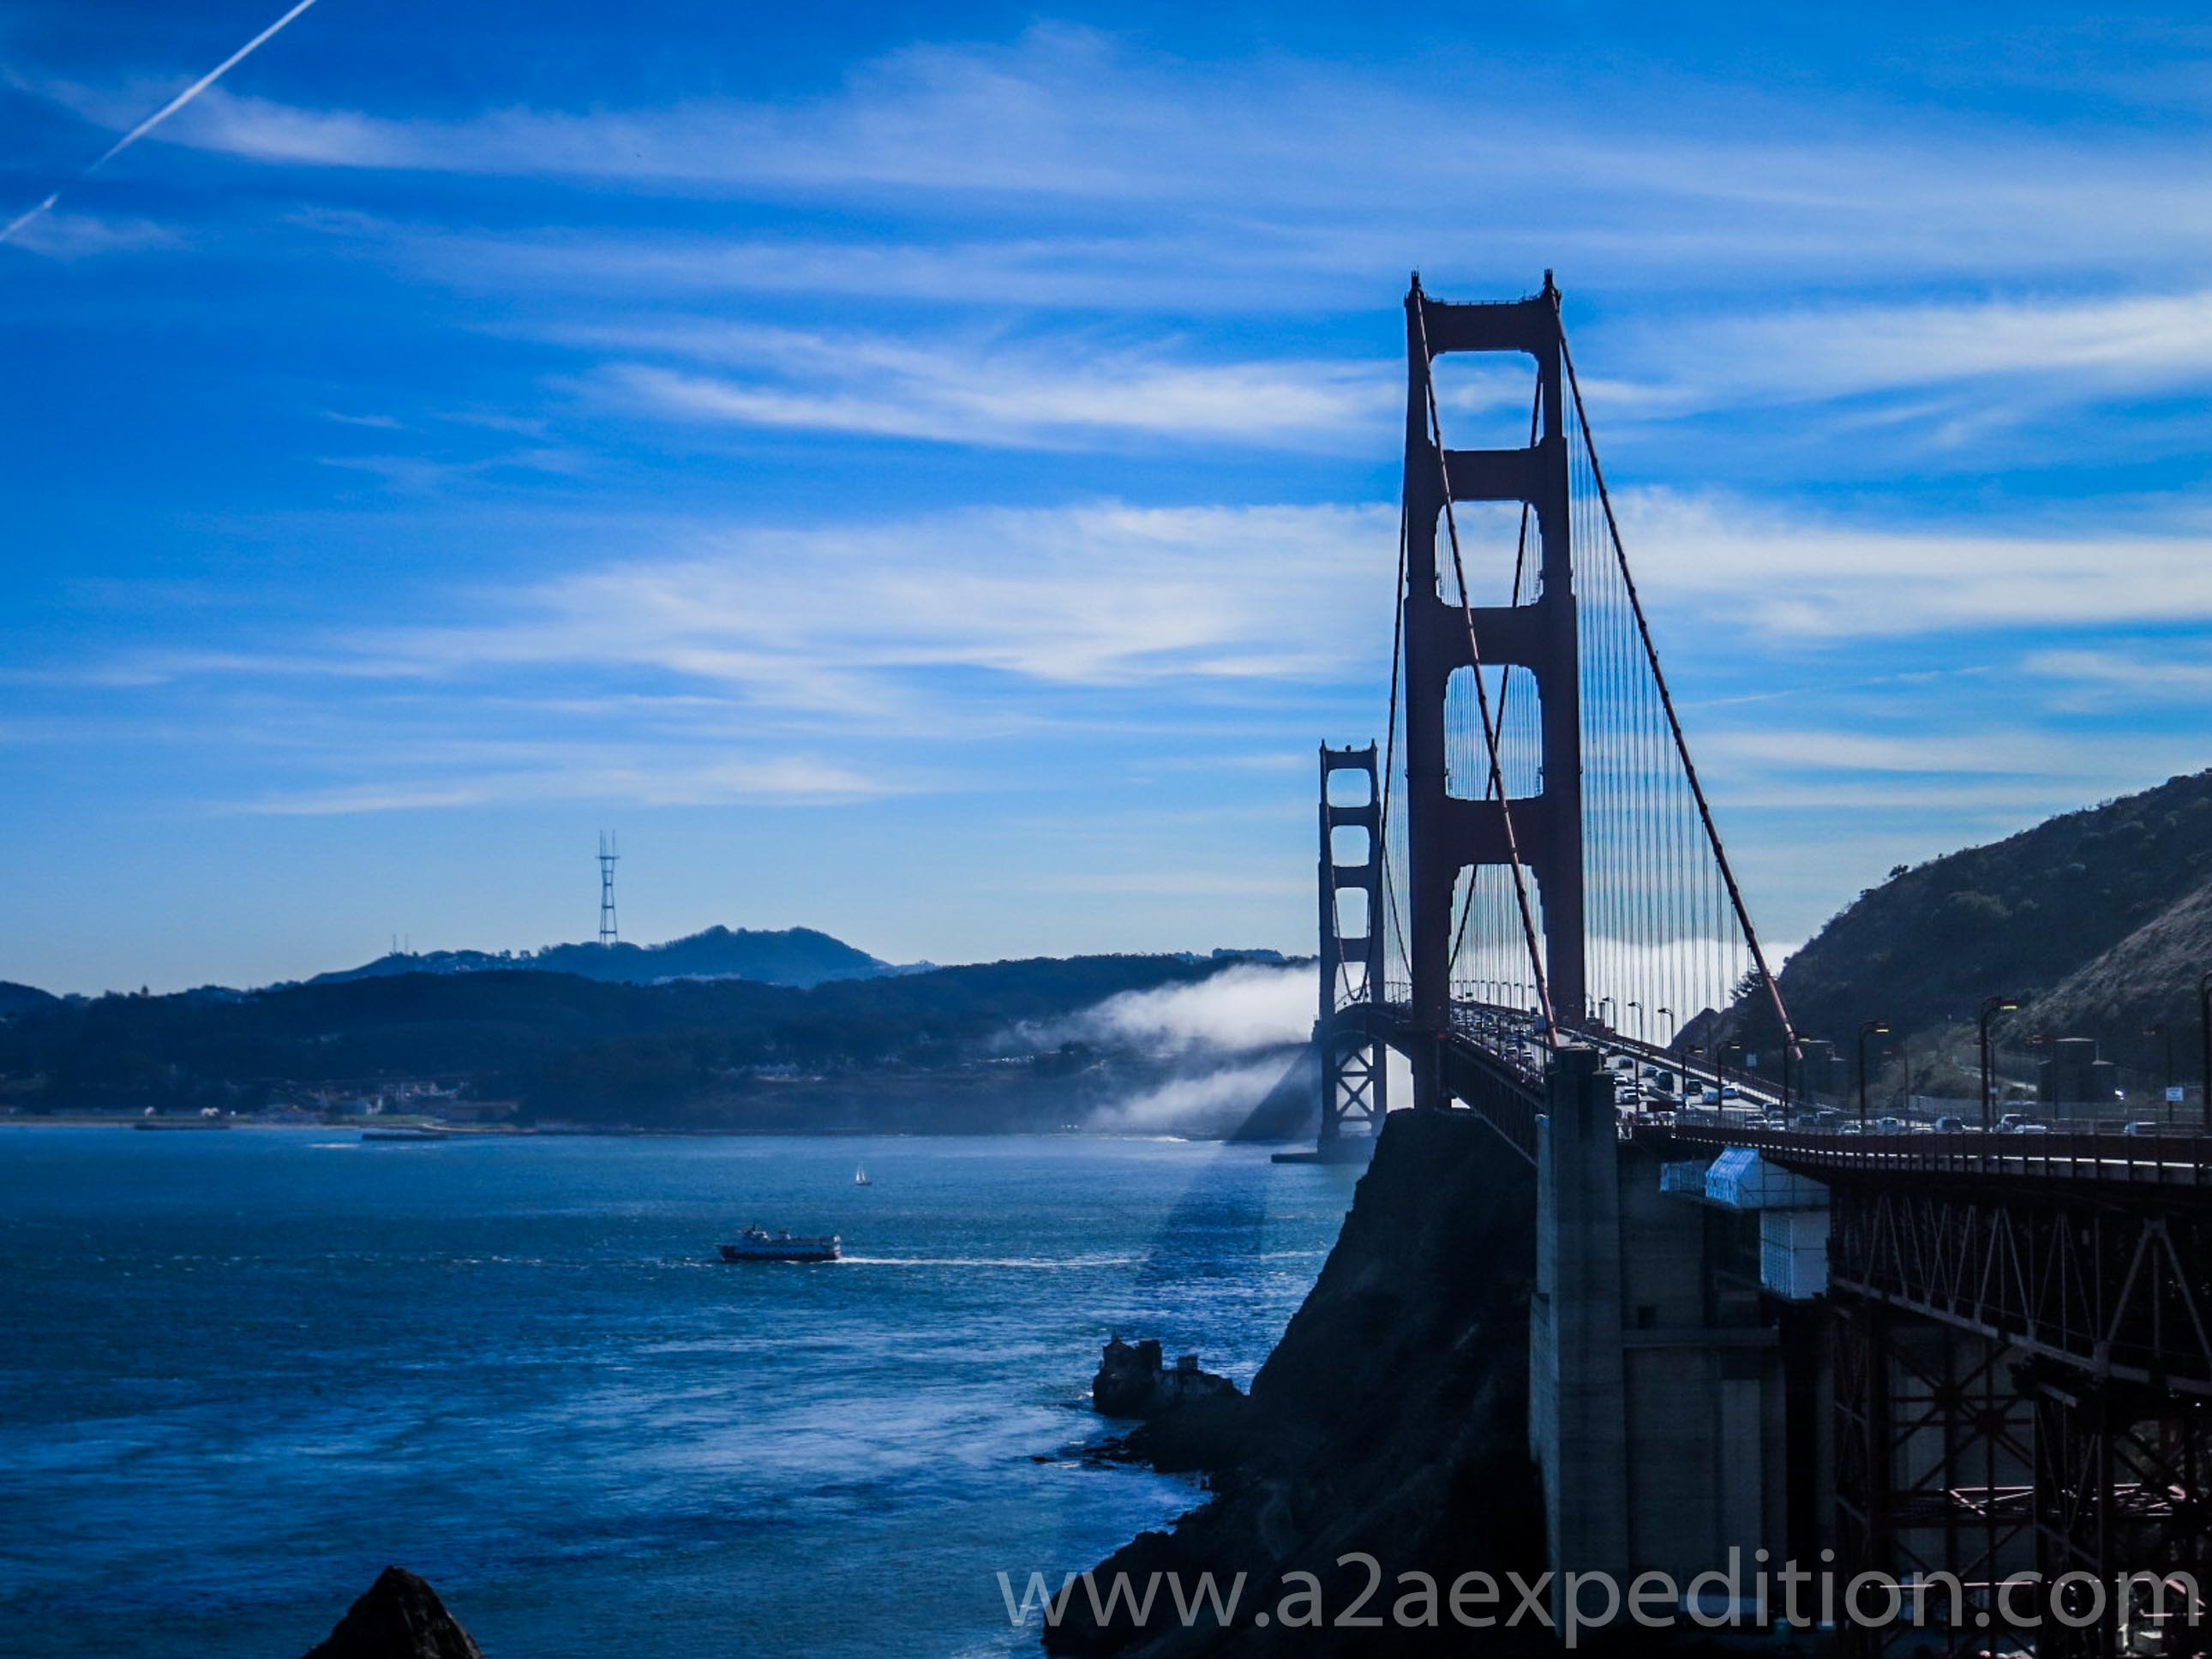 Golden Gate Bridge, A2A Expedition